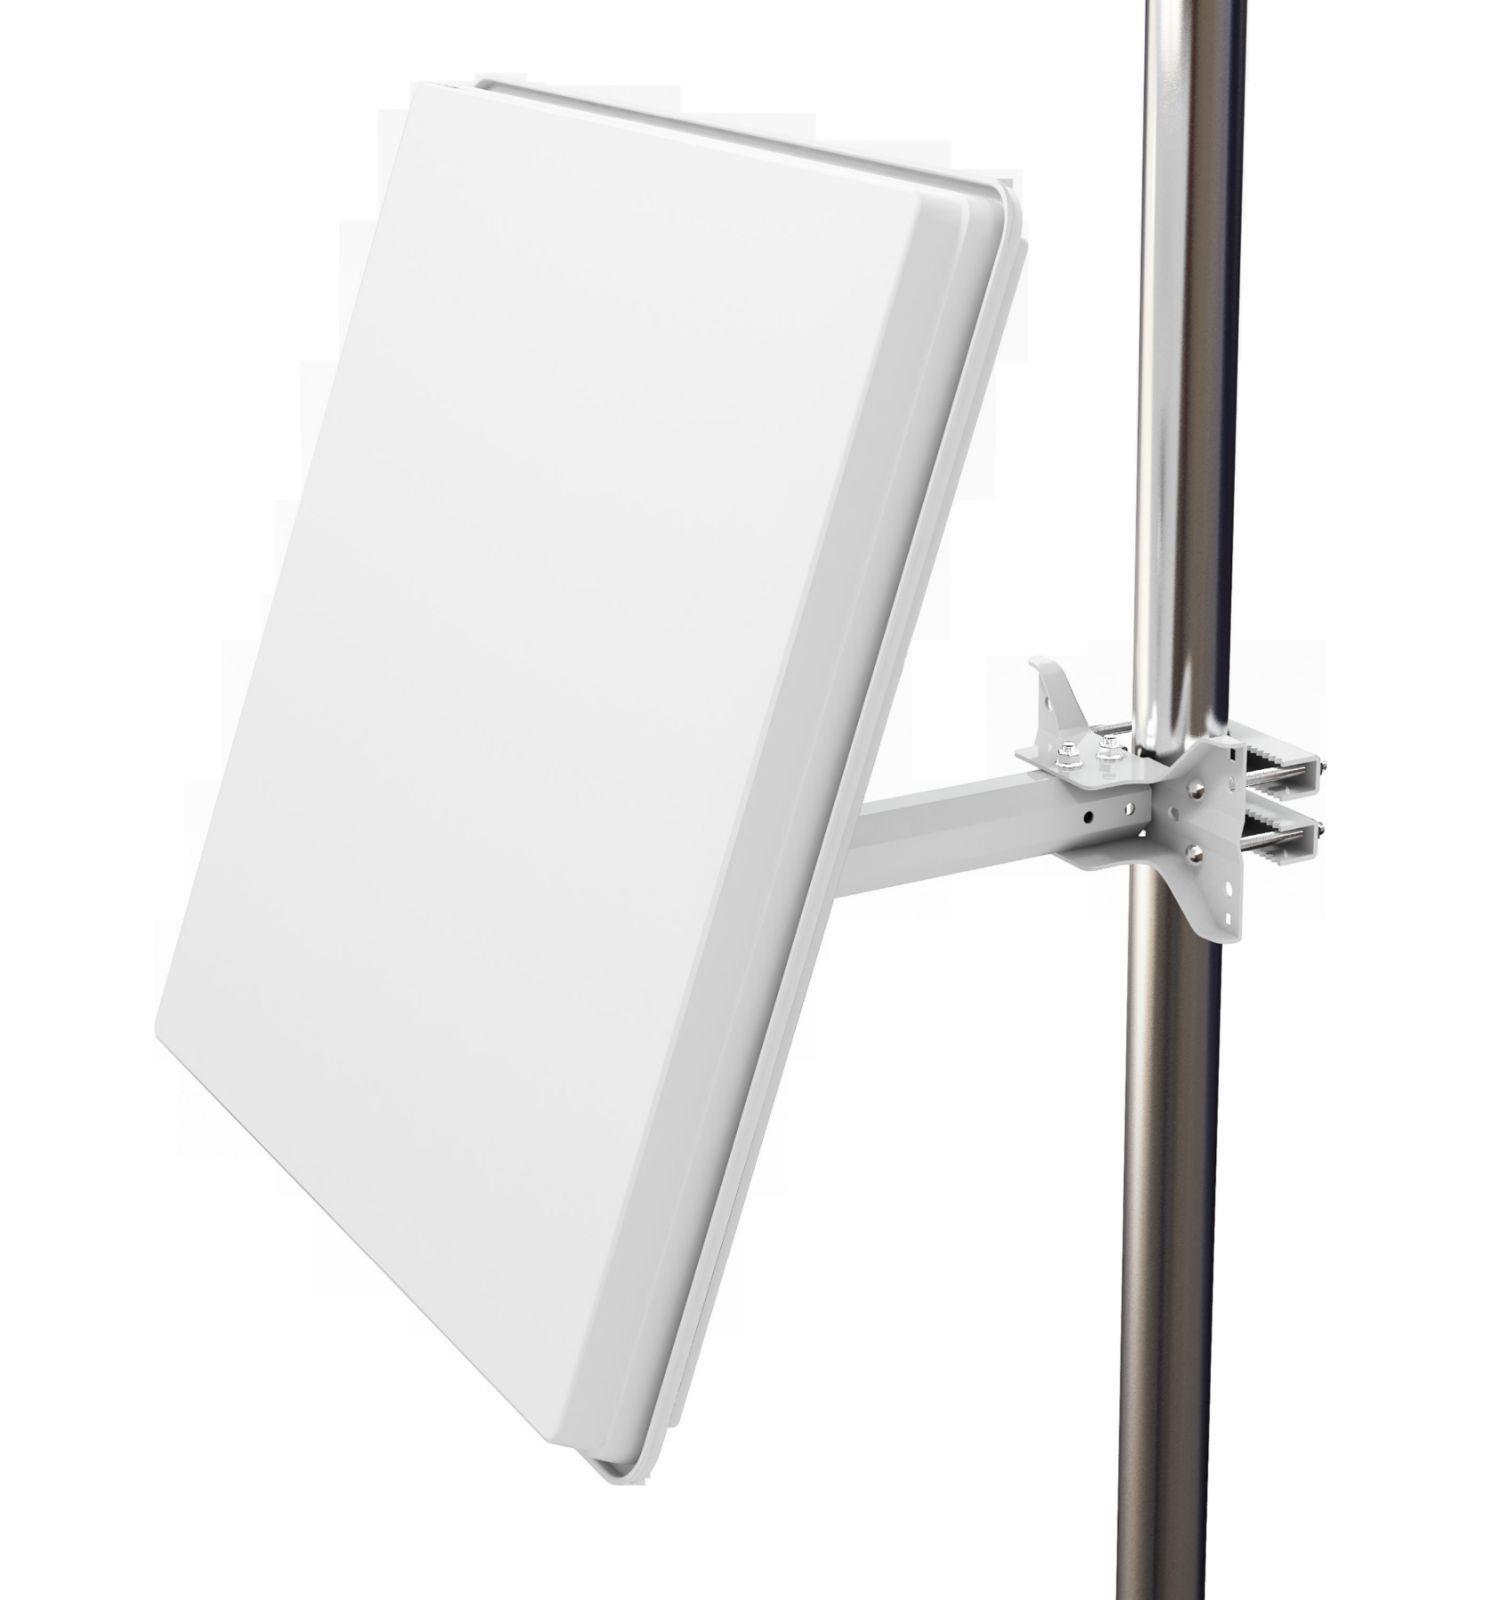 am sat shop selfsat h50d flach antenne mit single lnb. Black Bedroom Furniture Sets. Home Design Ideas